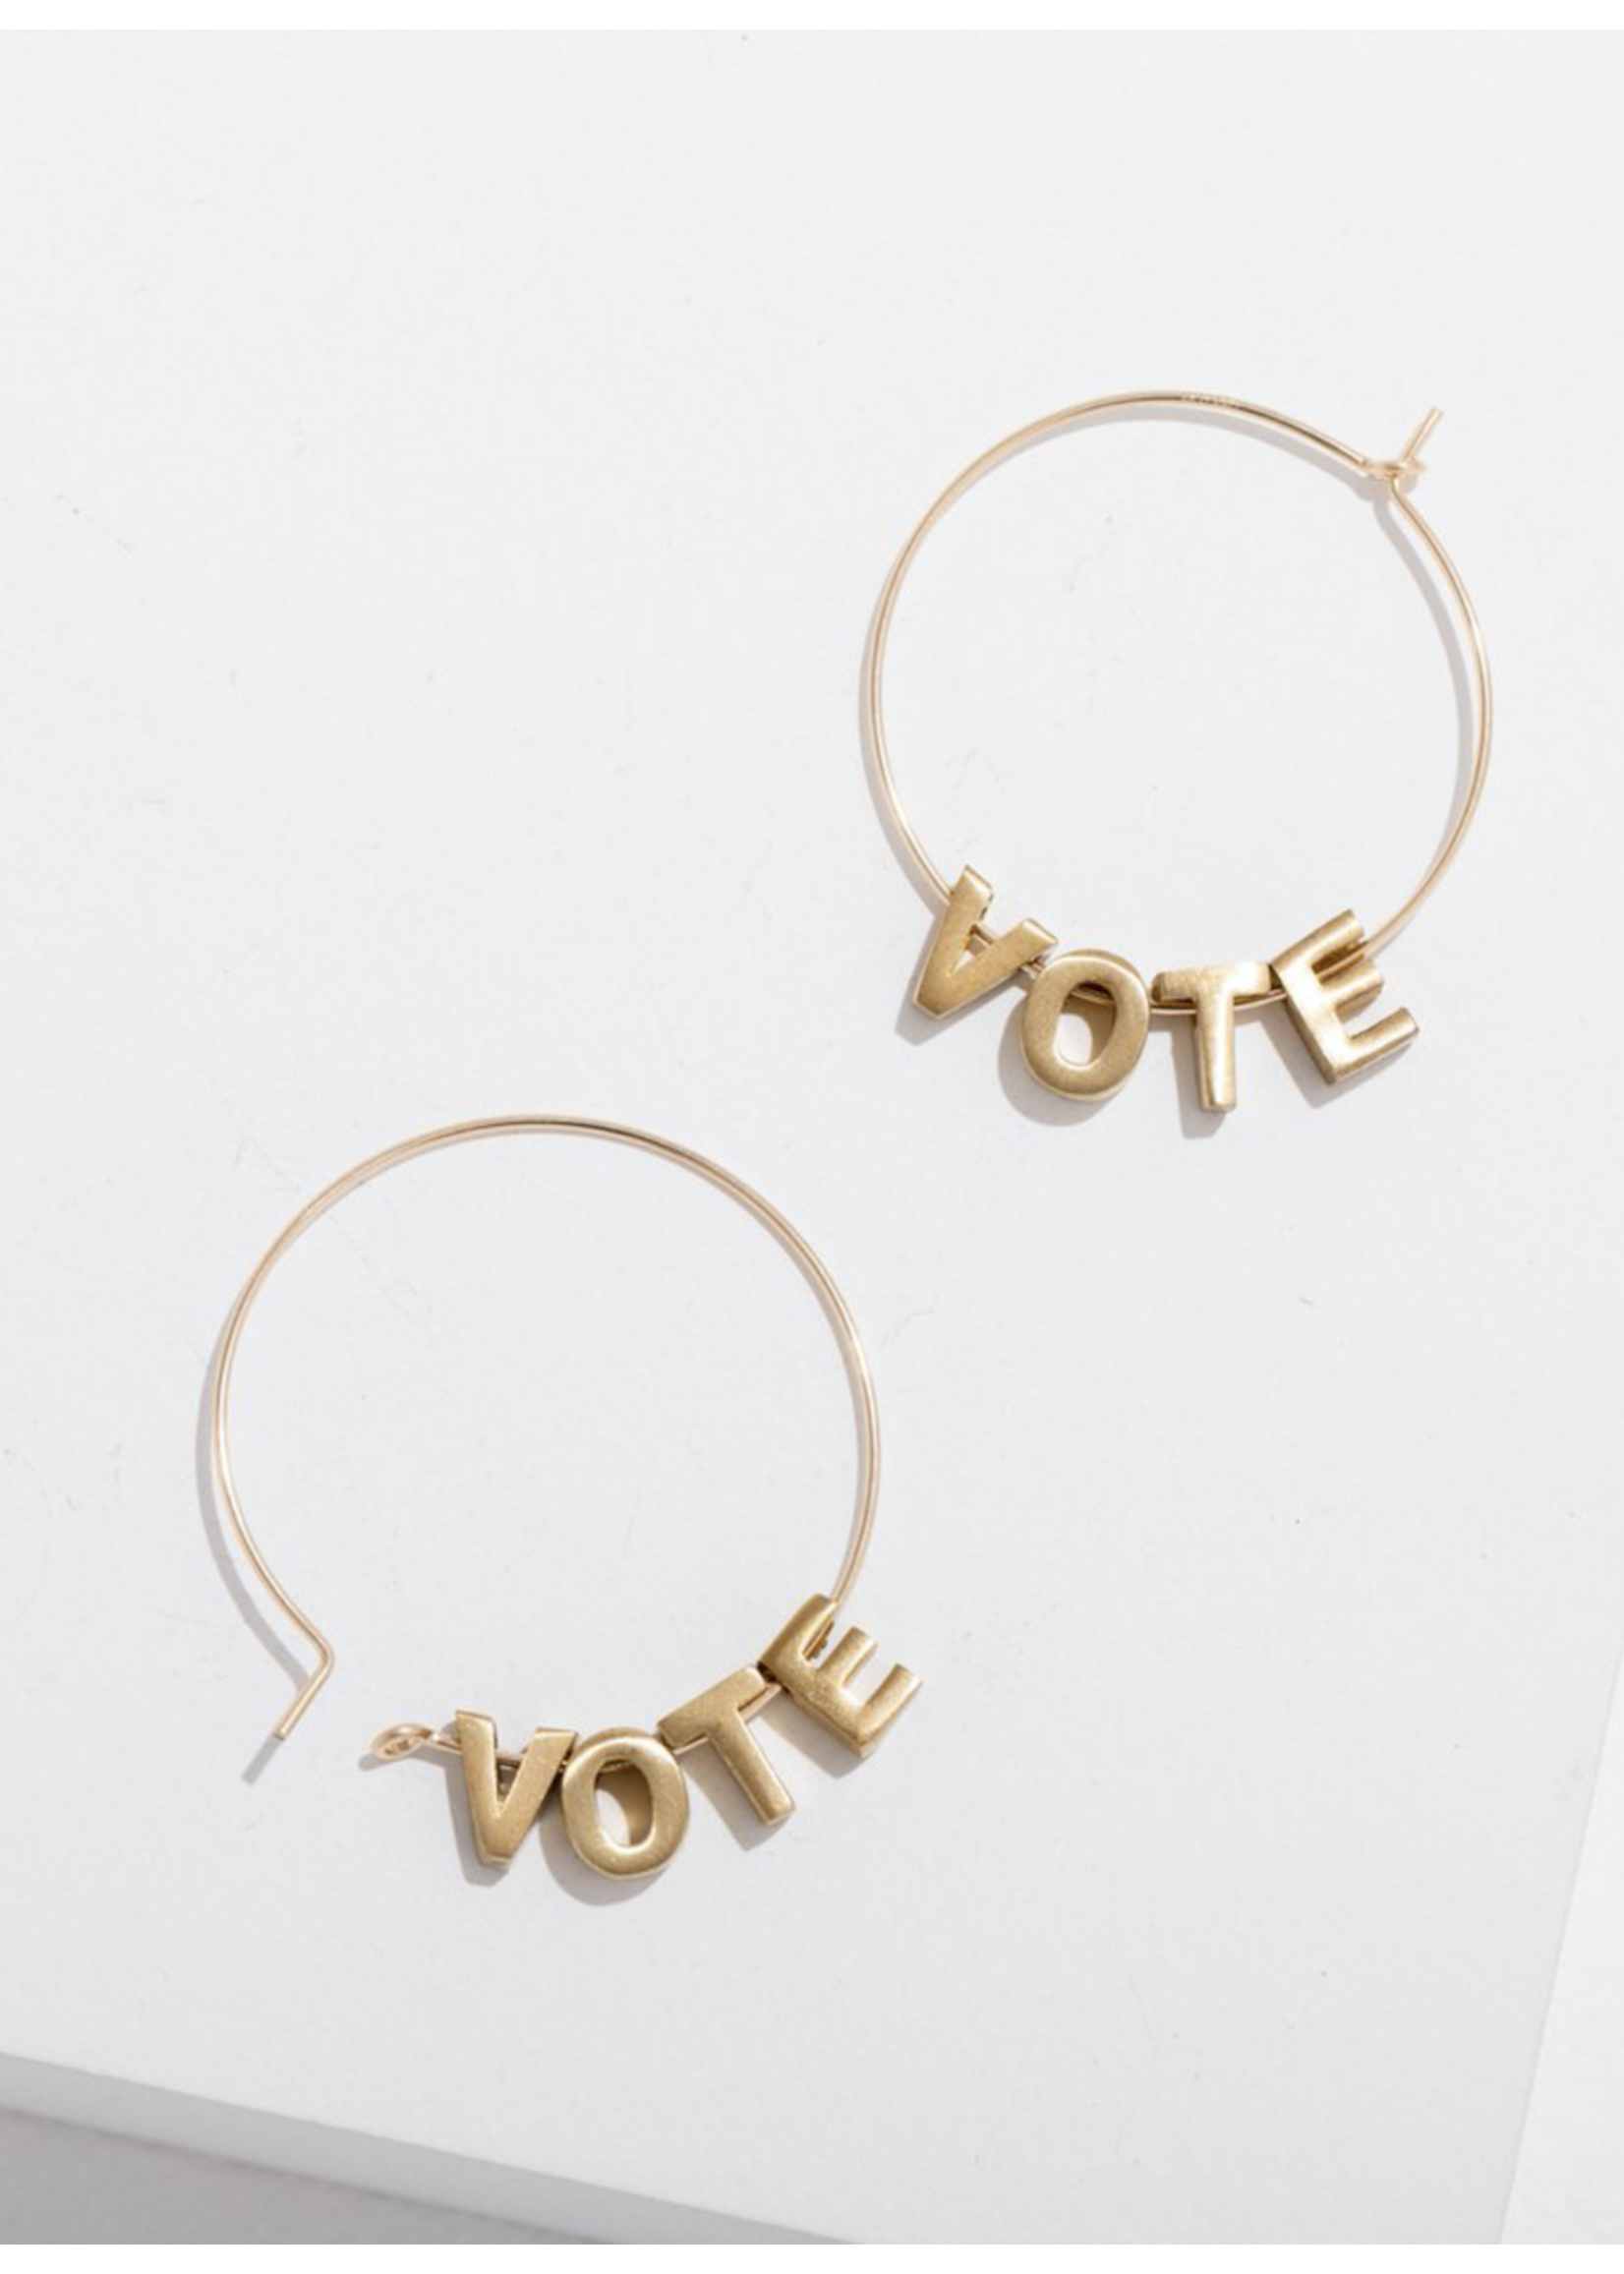 Larissa Loden Larissa Loden Vote Earrings